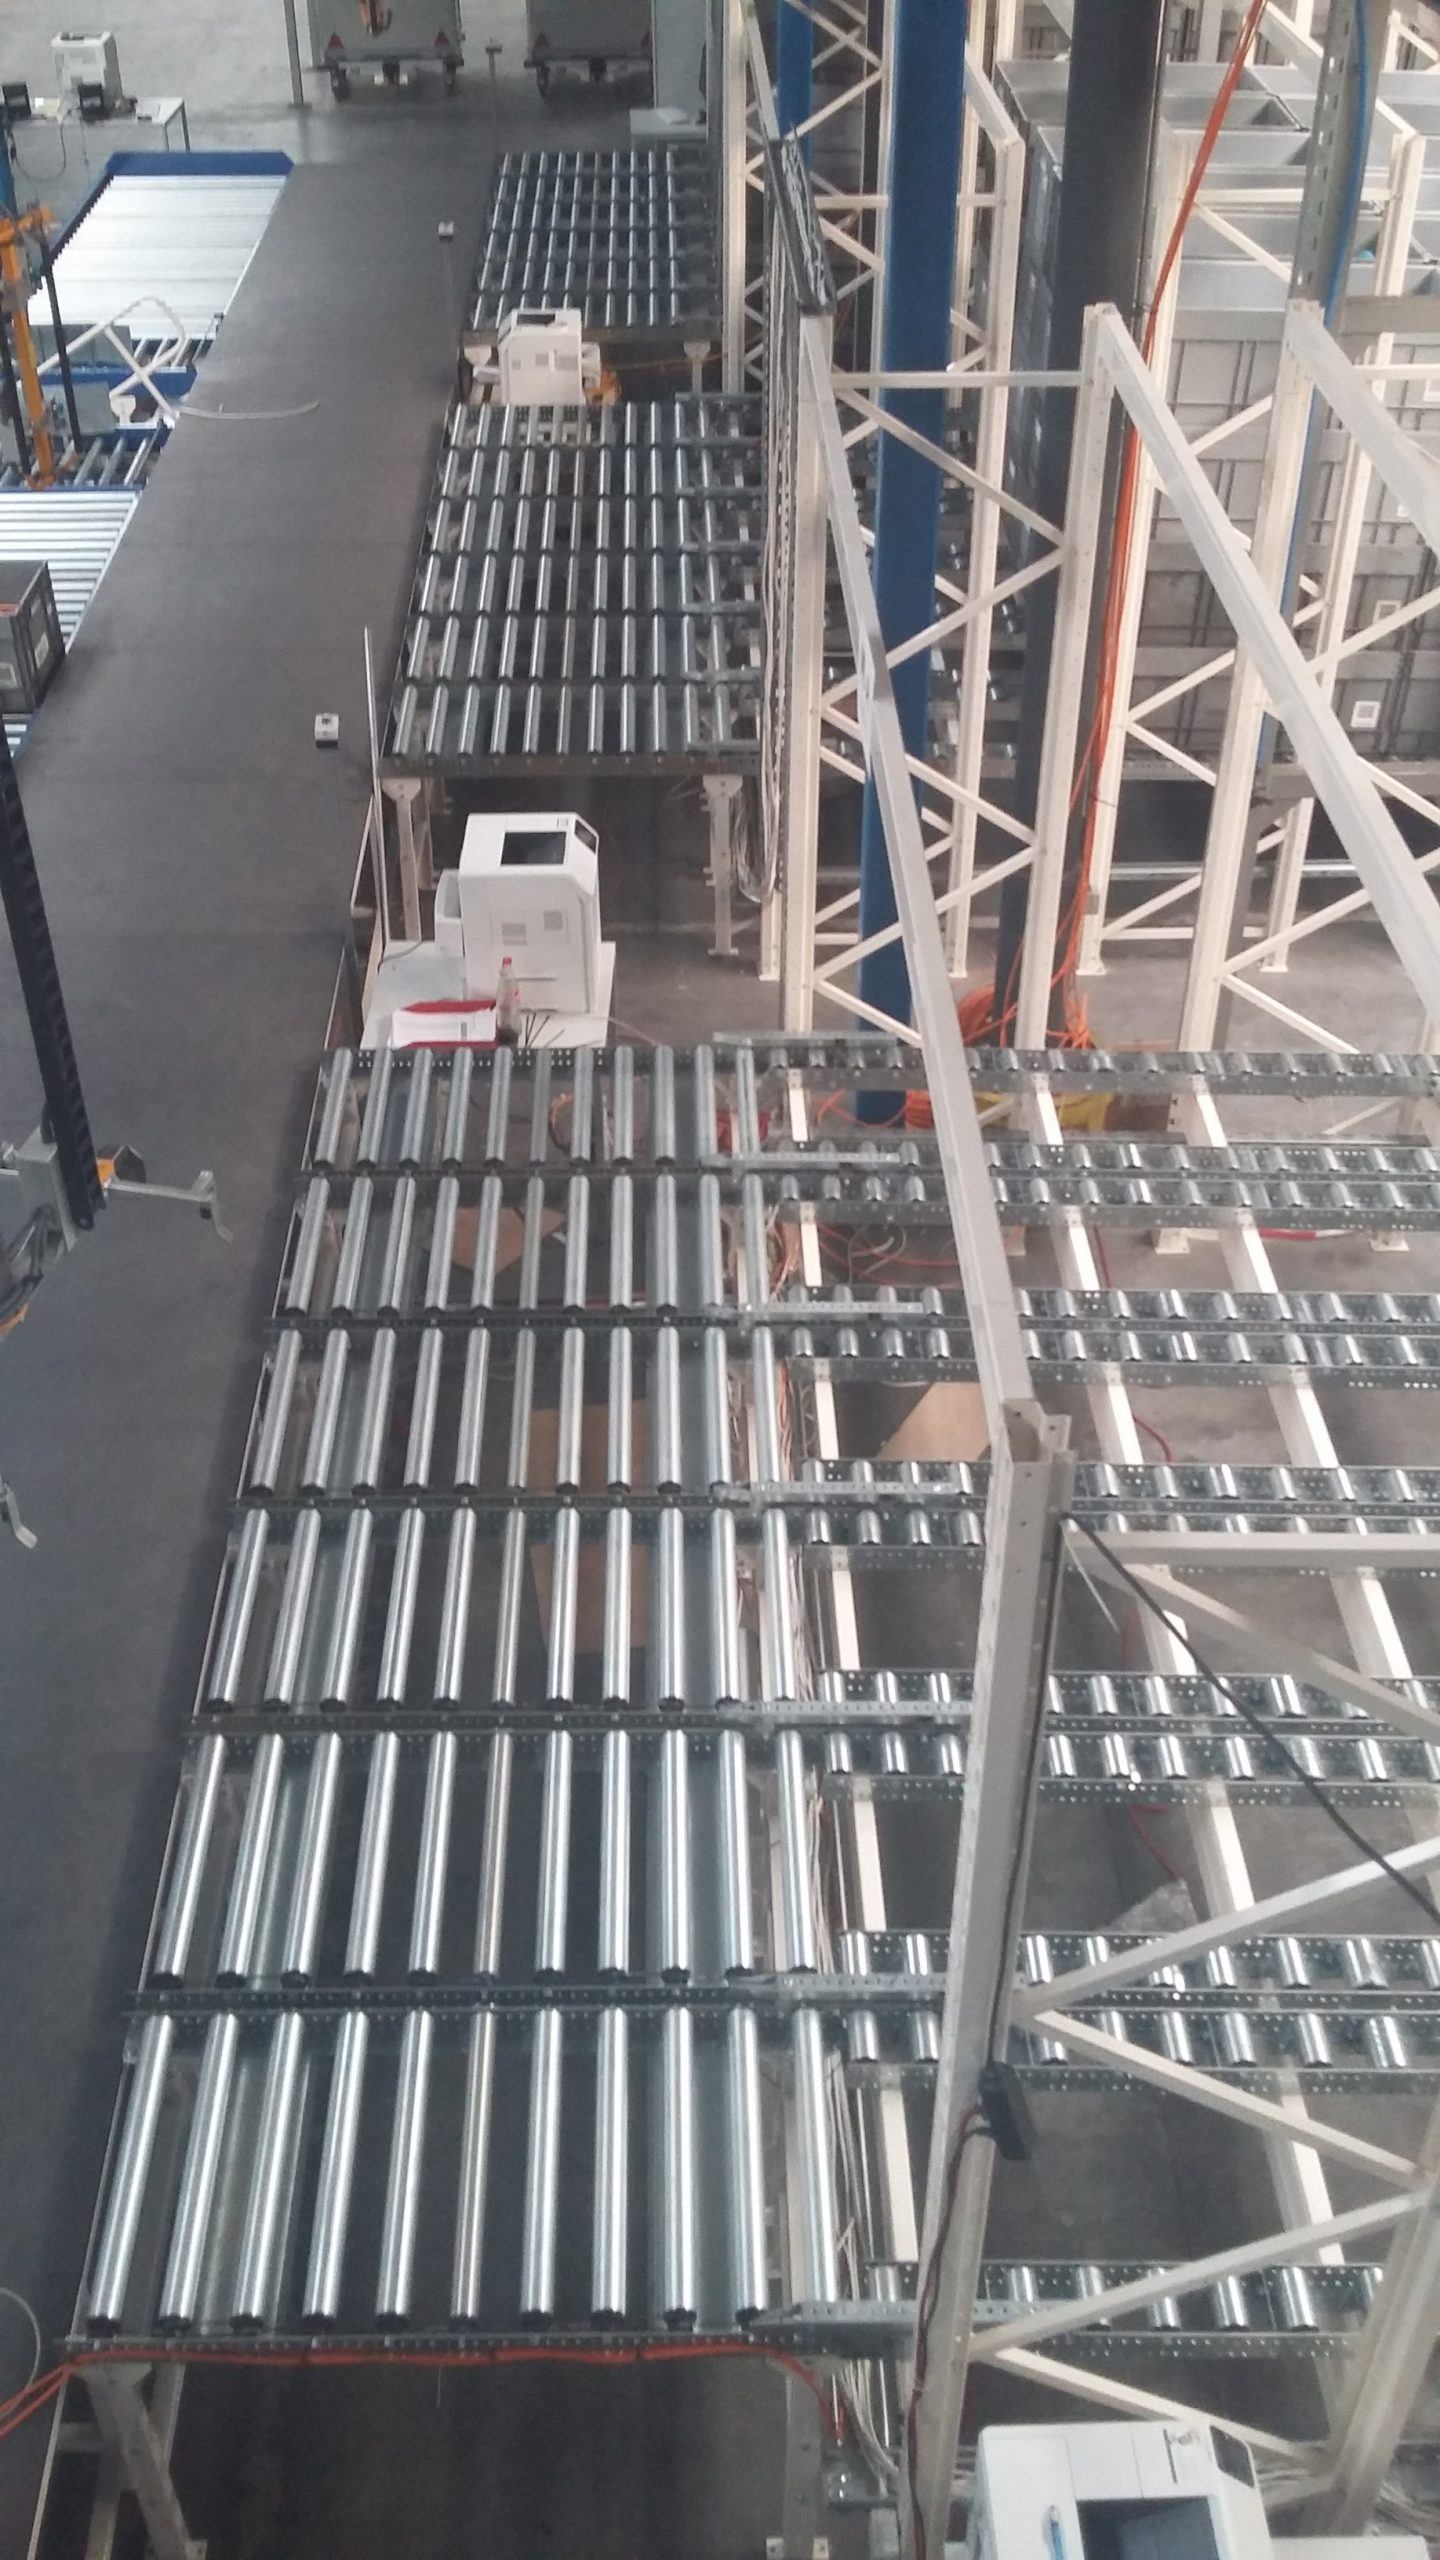 Production warehouse automation for Kromberg&Schubert - 18 - kapelou.com